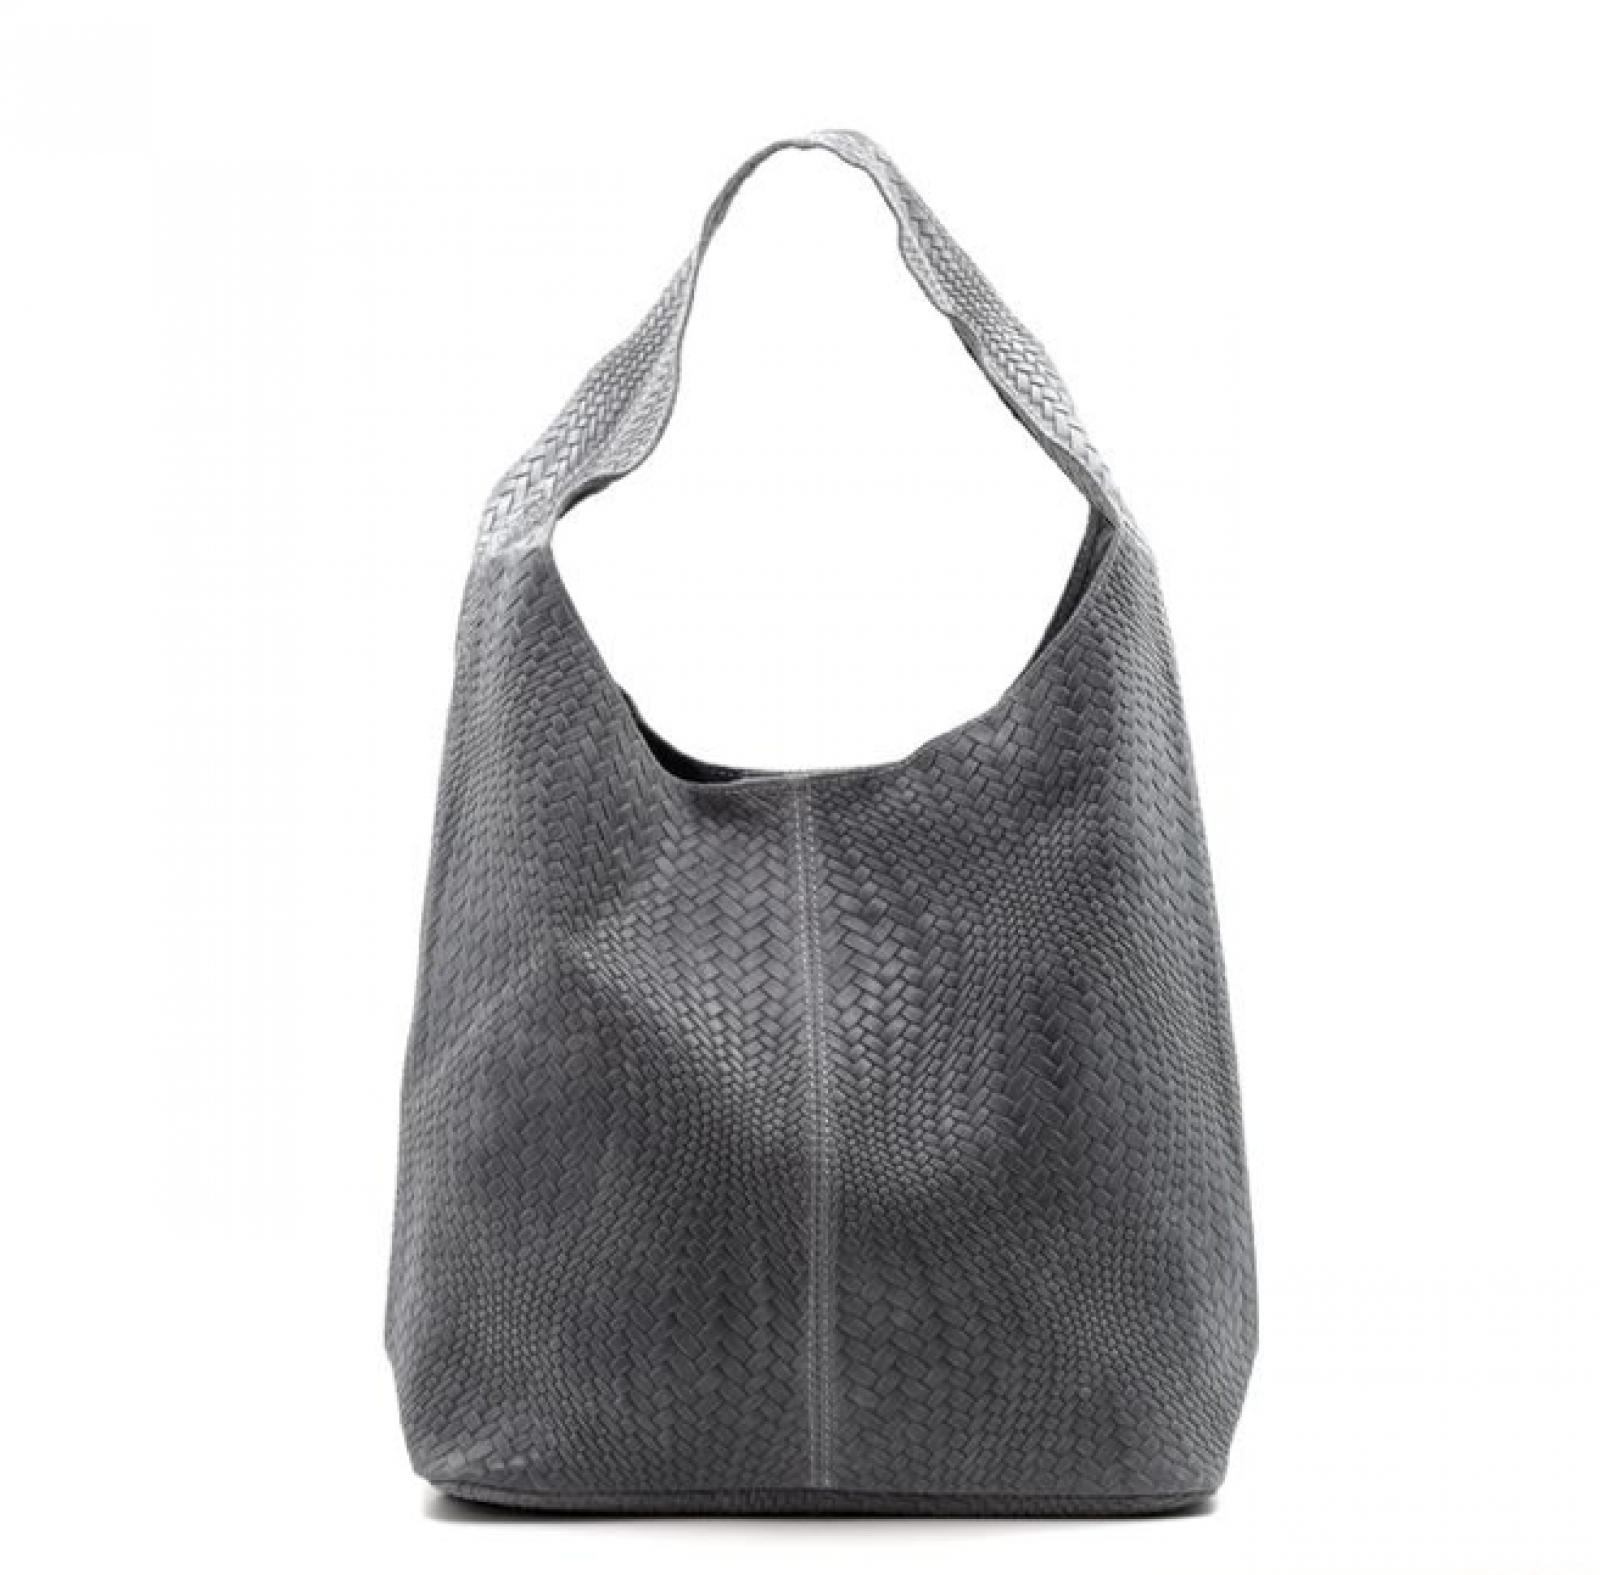 Leather Woven Large Handbag - Dark Grey